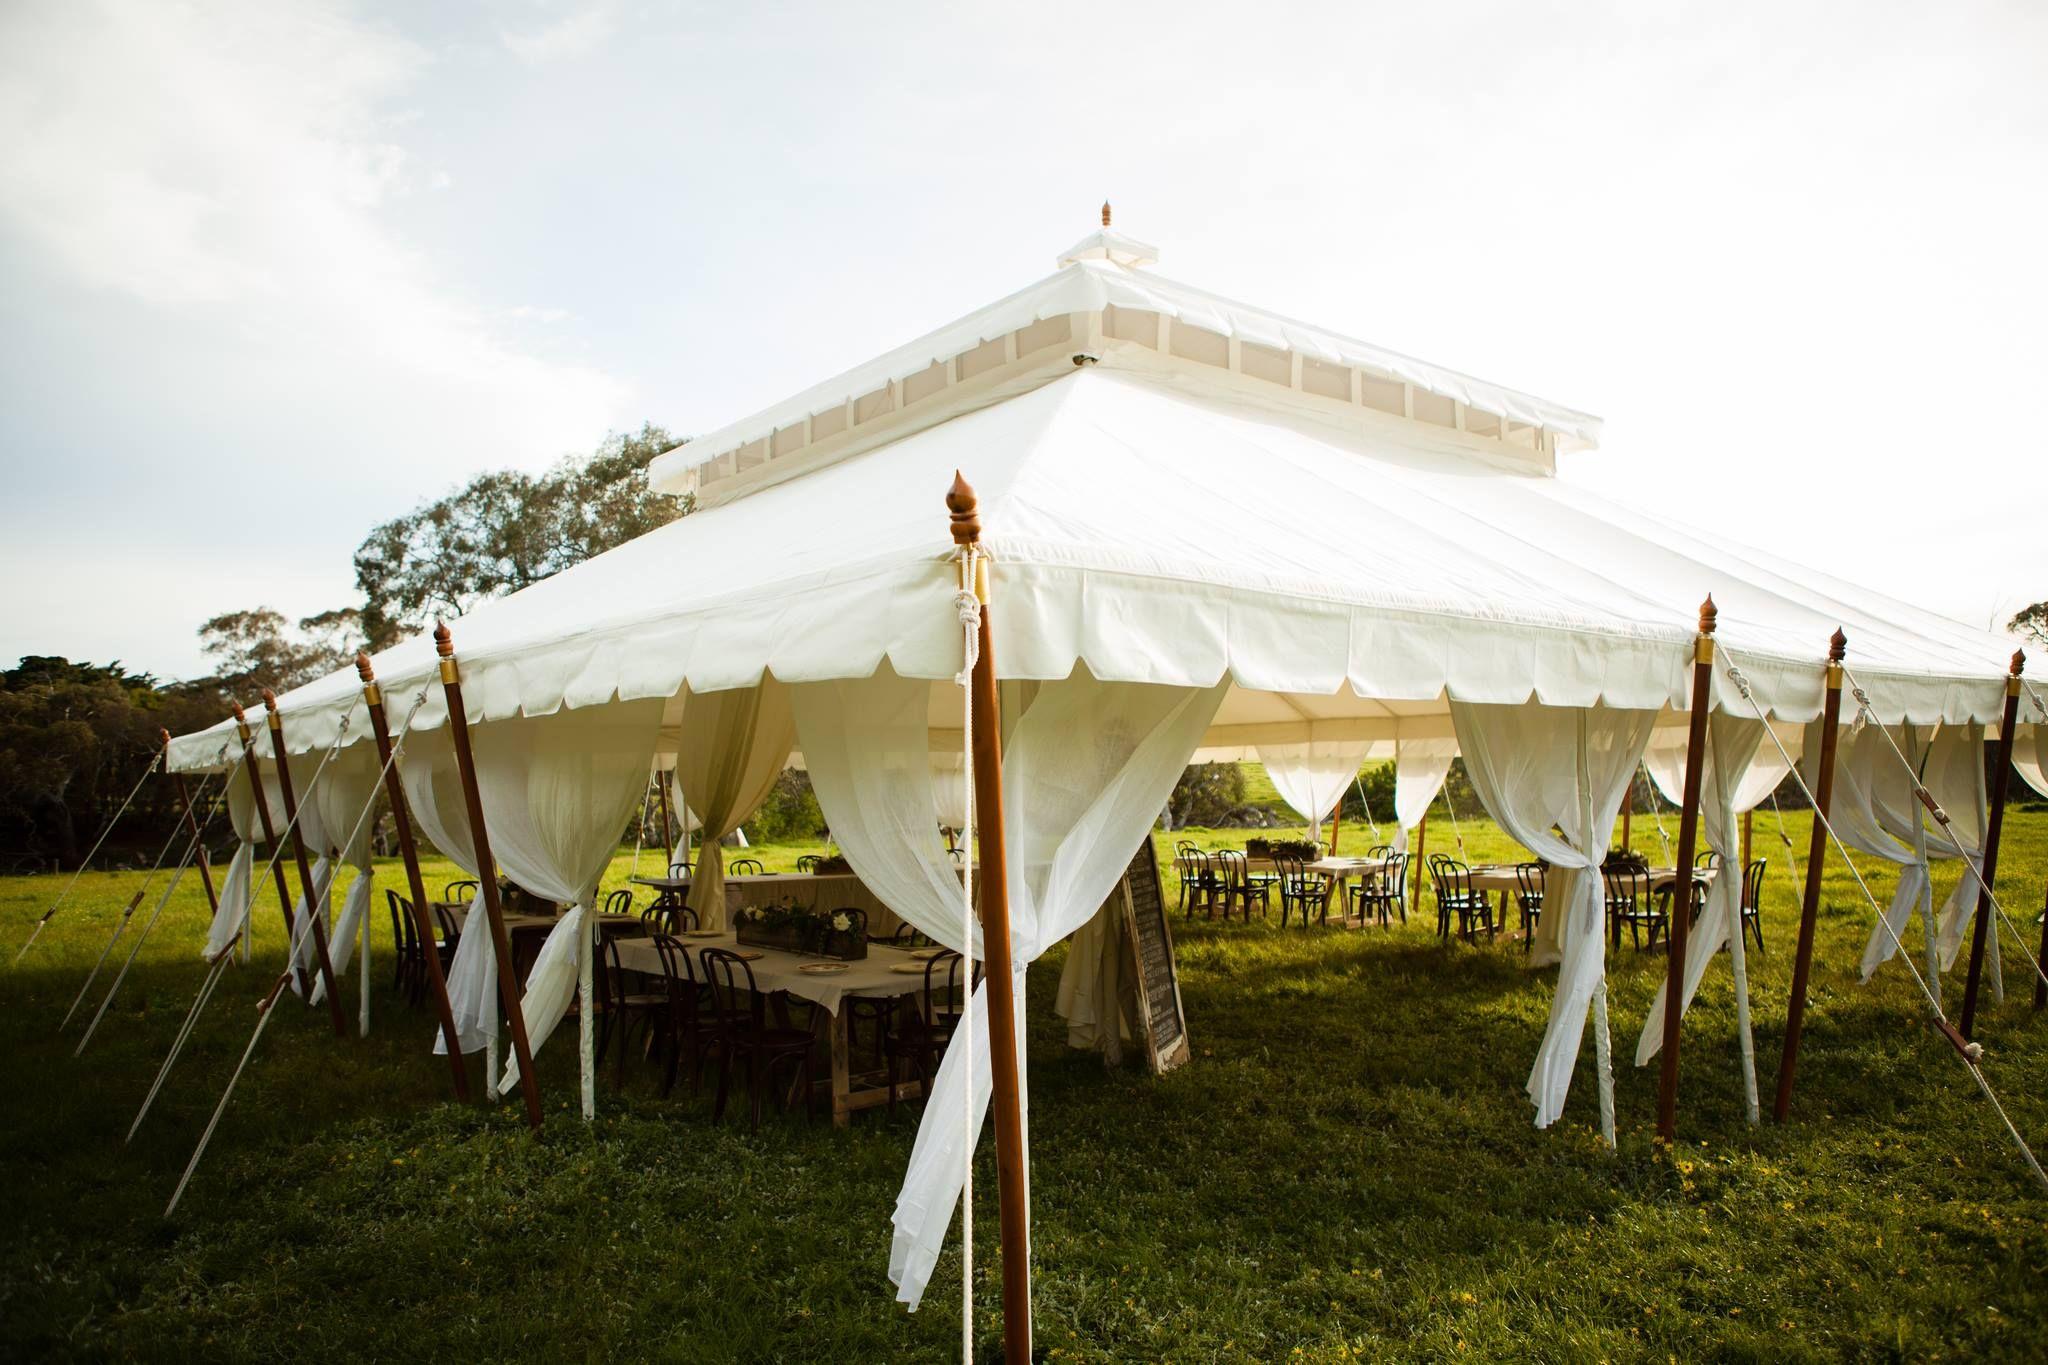 Wedding decor images  DECOR HIRE Tent Luxury Hire VIC Australia  View more on The LANE